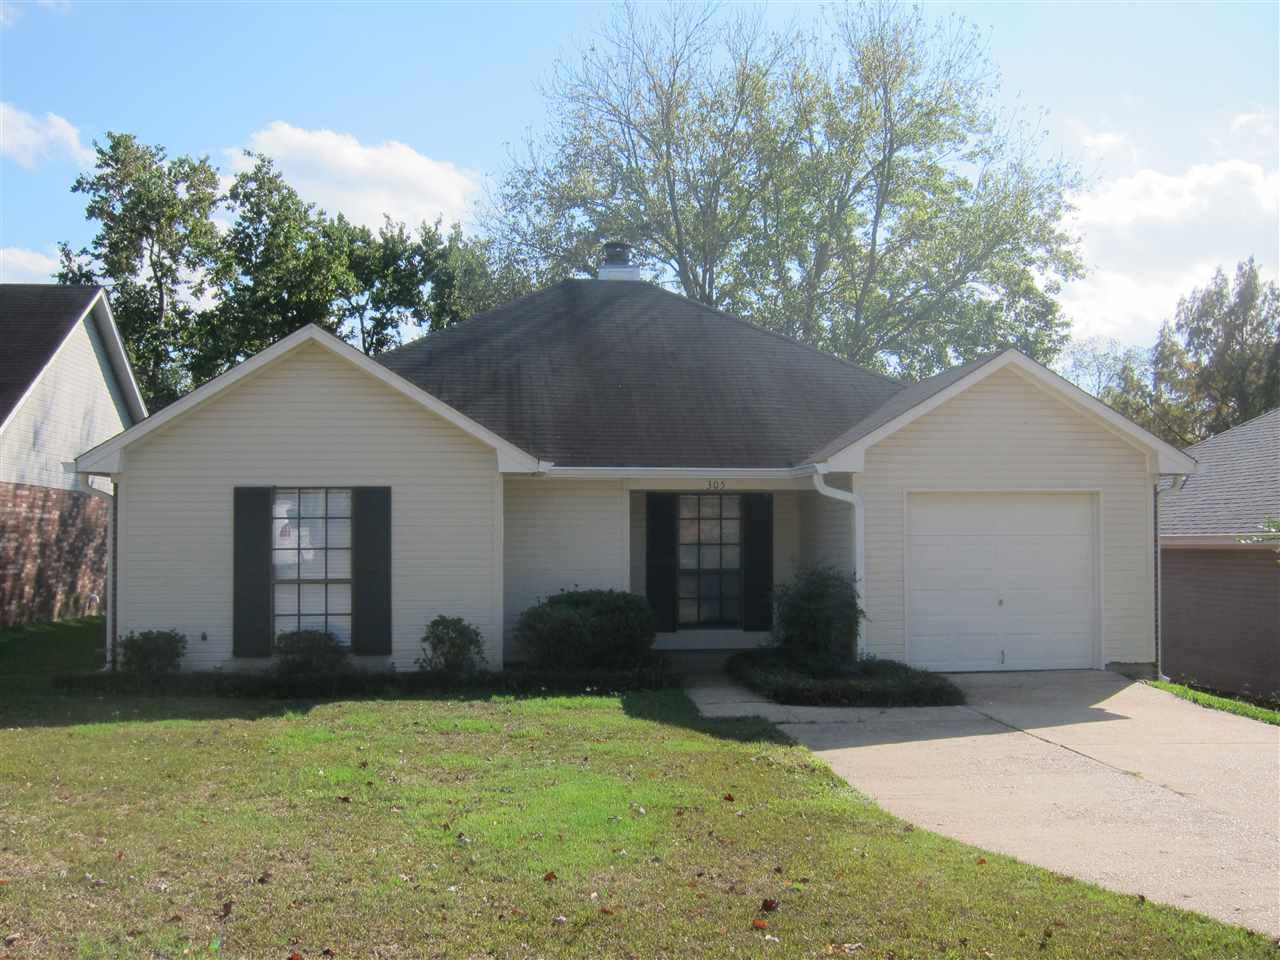 Real Estate for Sale, ListingId: 35999016, Ridgeland,MS39157